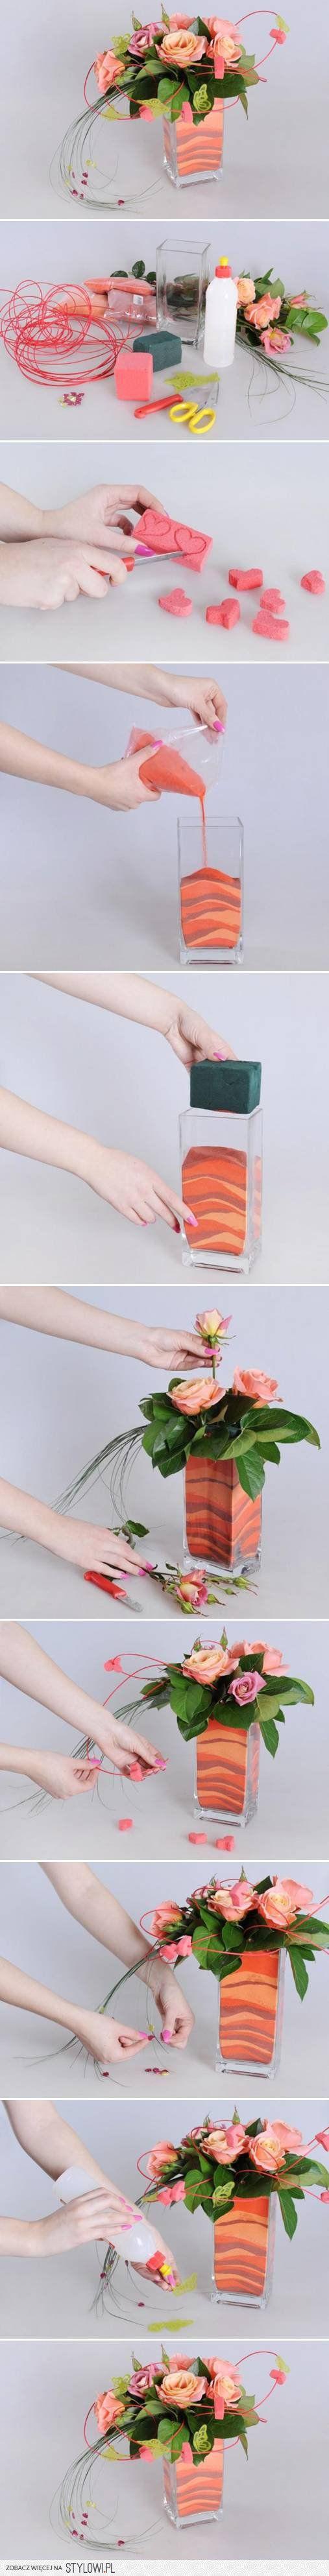 DIY Flower Vase with Sand DIY Projects | UsefulDIY.com na Stylowi.pl